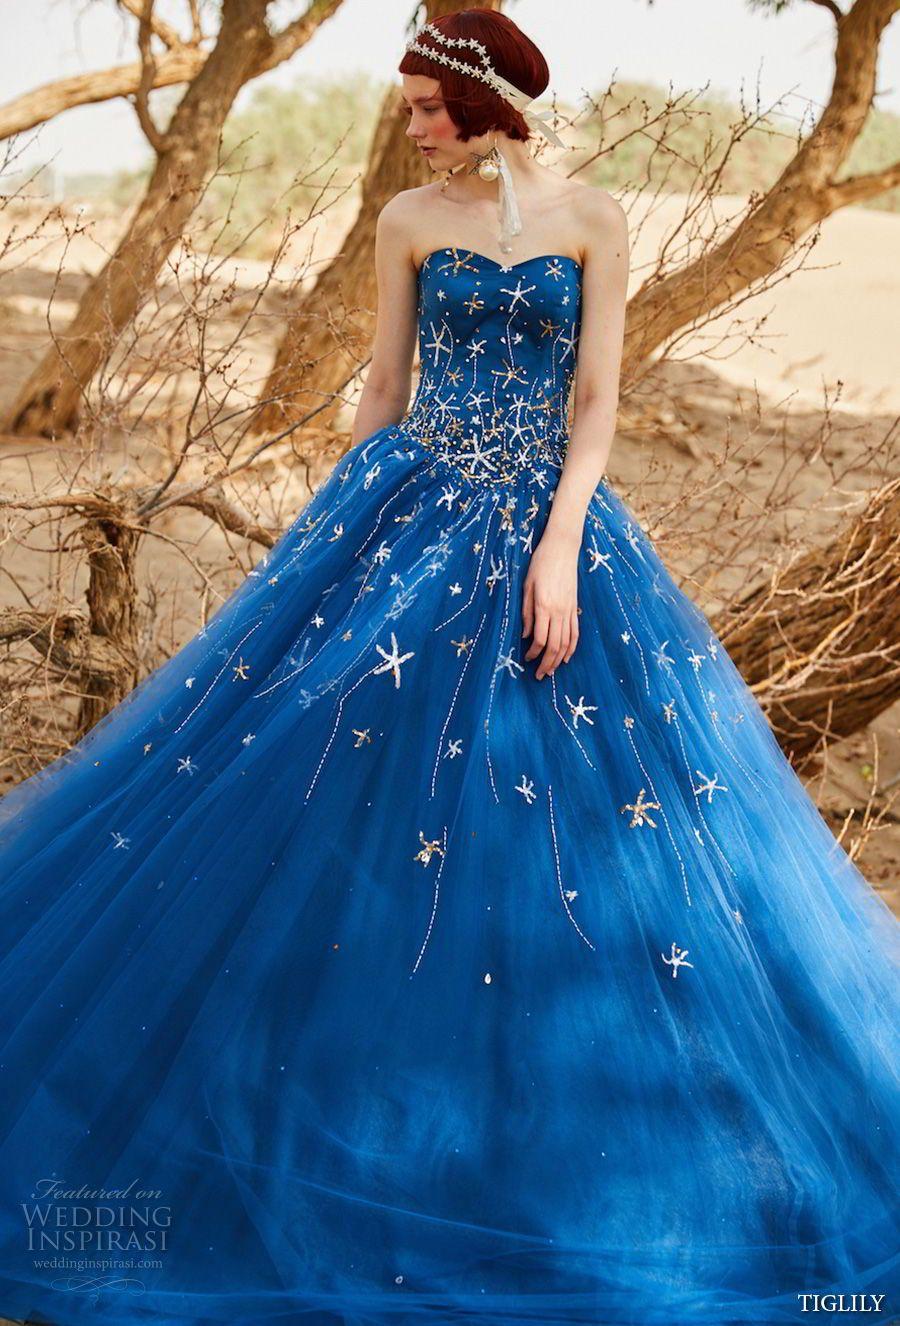 TIGLILY Wedding Dresses Bright Cobalt BlueRoyal Blue Wedding